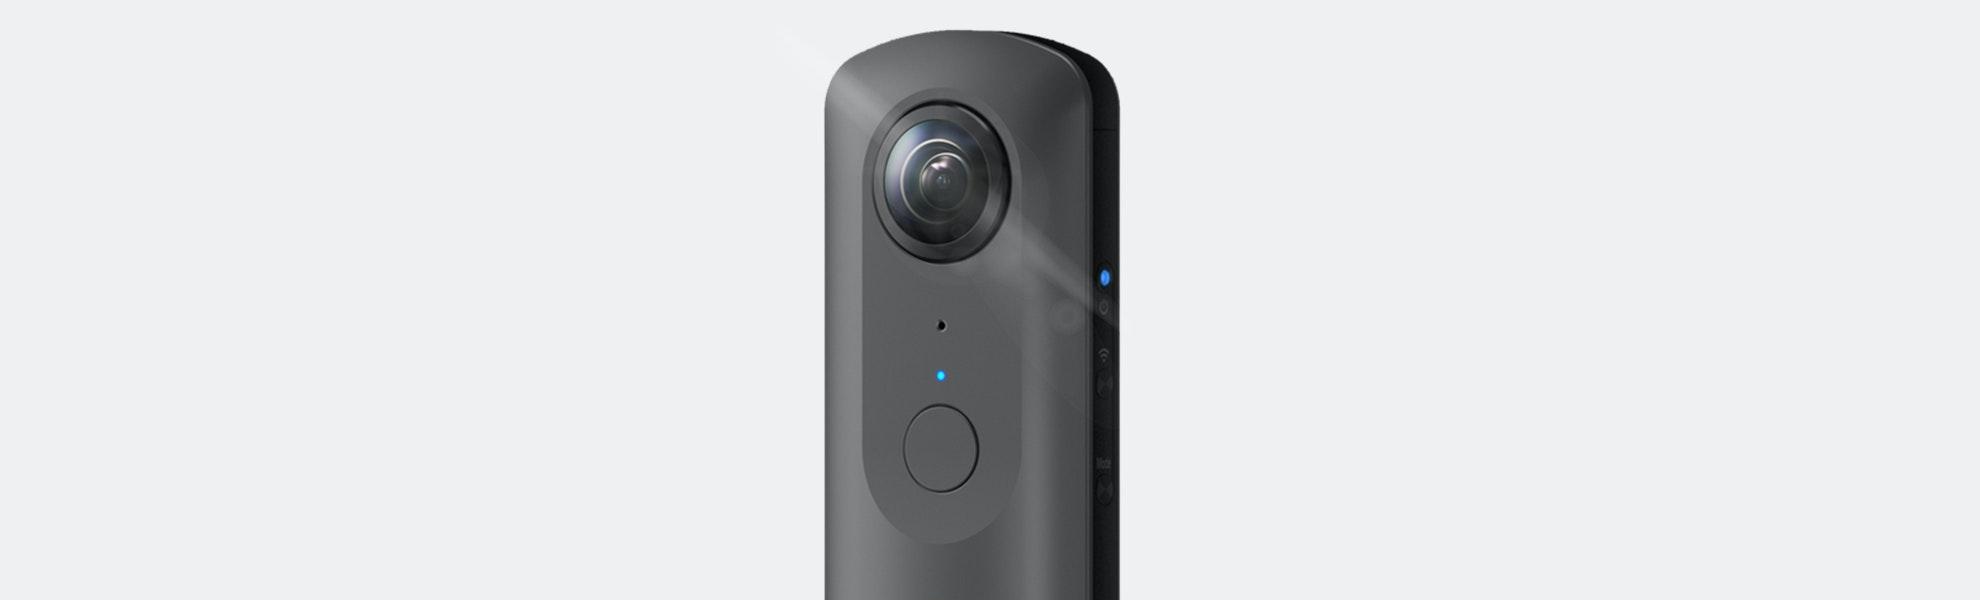 Ricoh Theta V 360 Spherical Camera